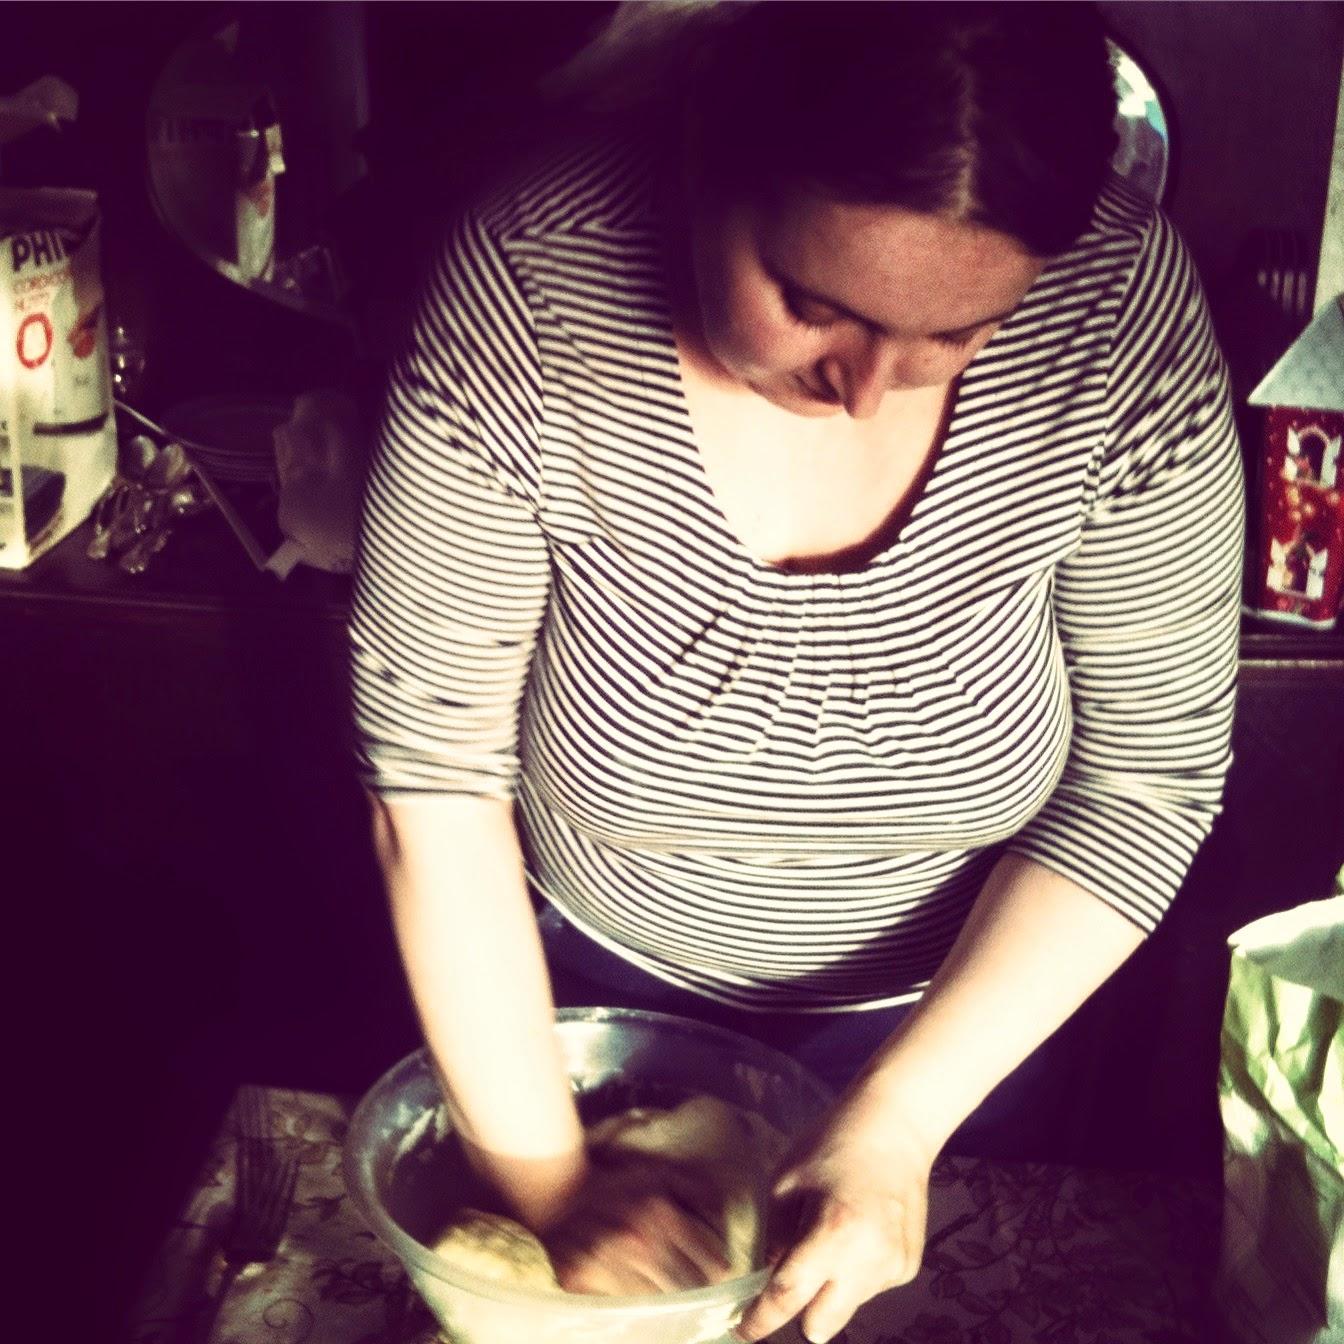 #saveourskills #bakingbread